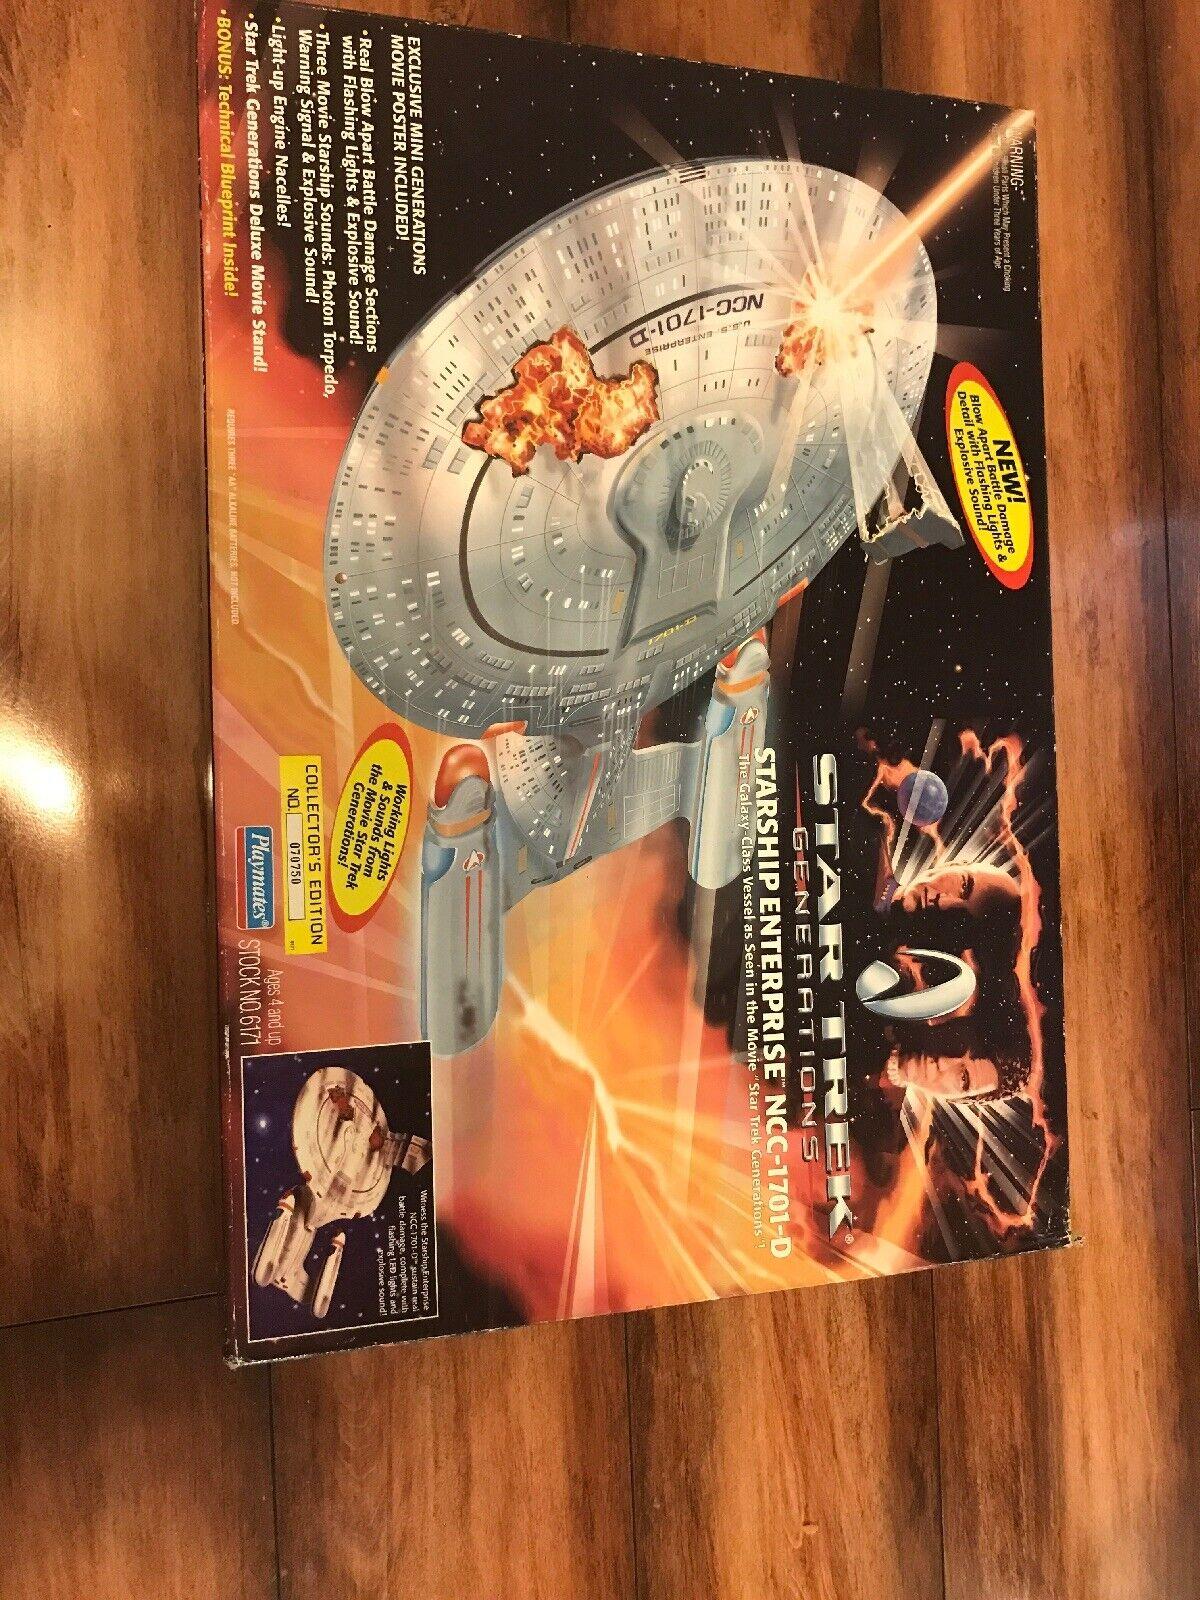 1994 estrella TREK GENERATIONS  ENTERPRISE NCC1701D PLAYMATES w blast panels